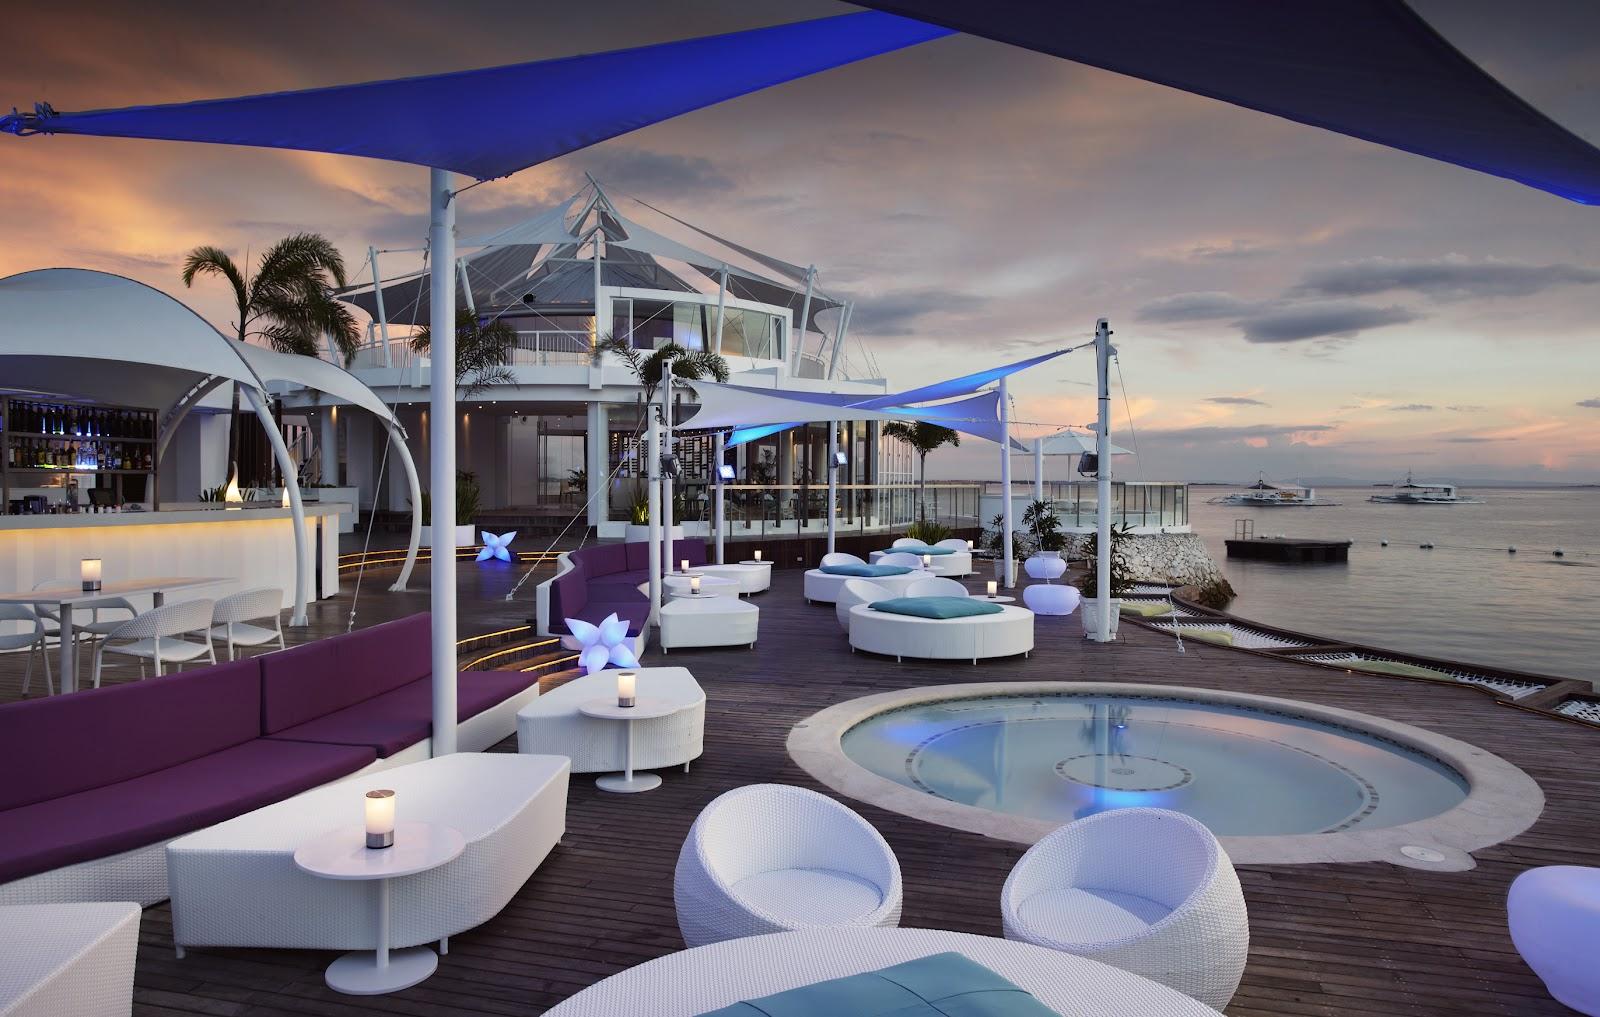 Cebu beaches, Cebu Beach Party, Beach Party, Ibiza Club beach party, Movenpick Hotel Mactan Island Cebu, Cebu Events, Perfumed Red Shoes,